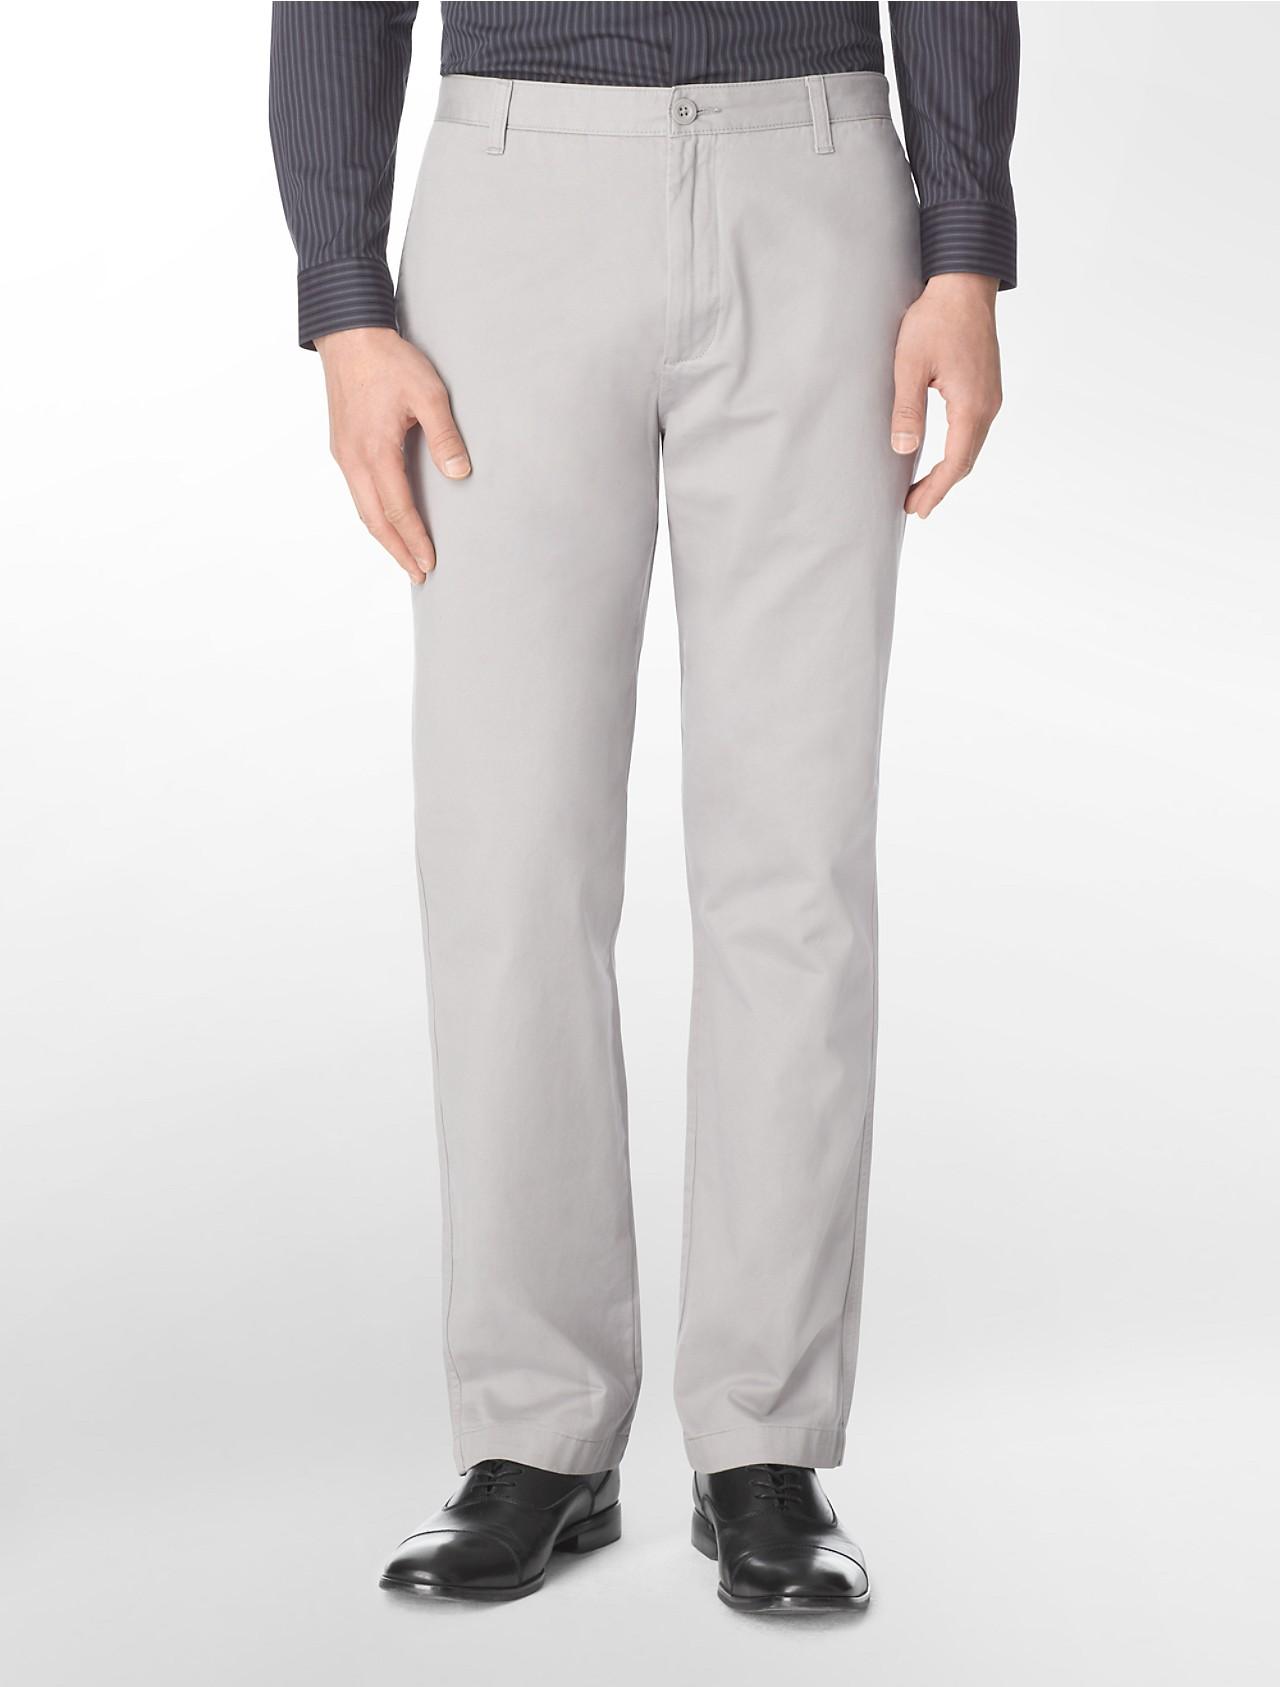 Calvin Klein Straight Fit Cotton Summer Pants for Men